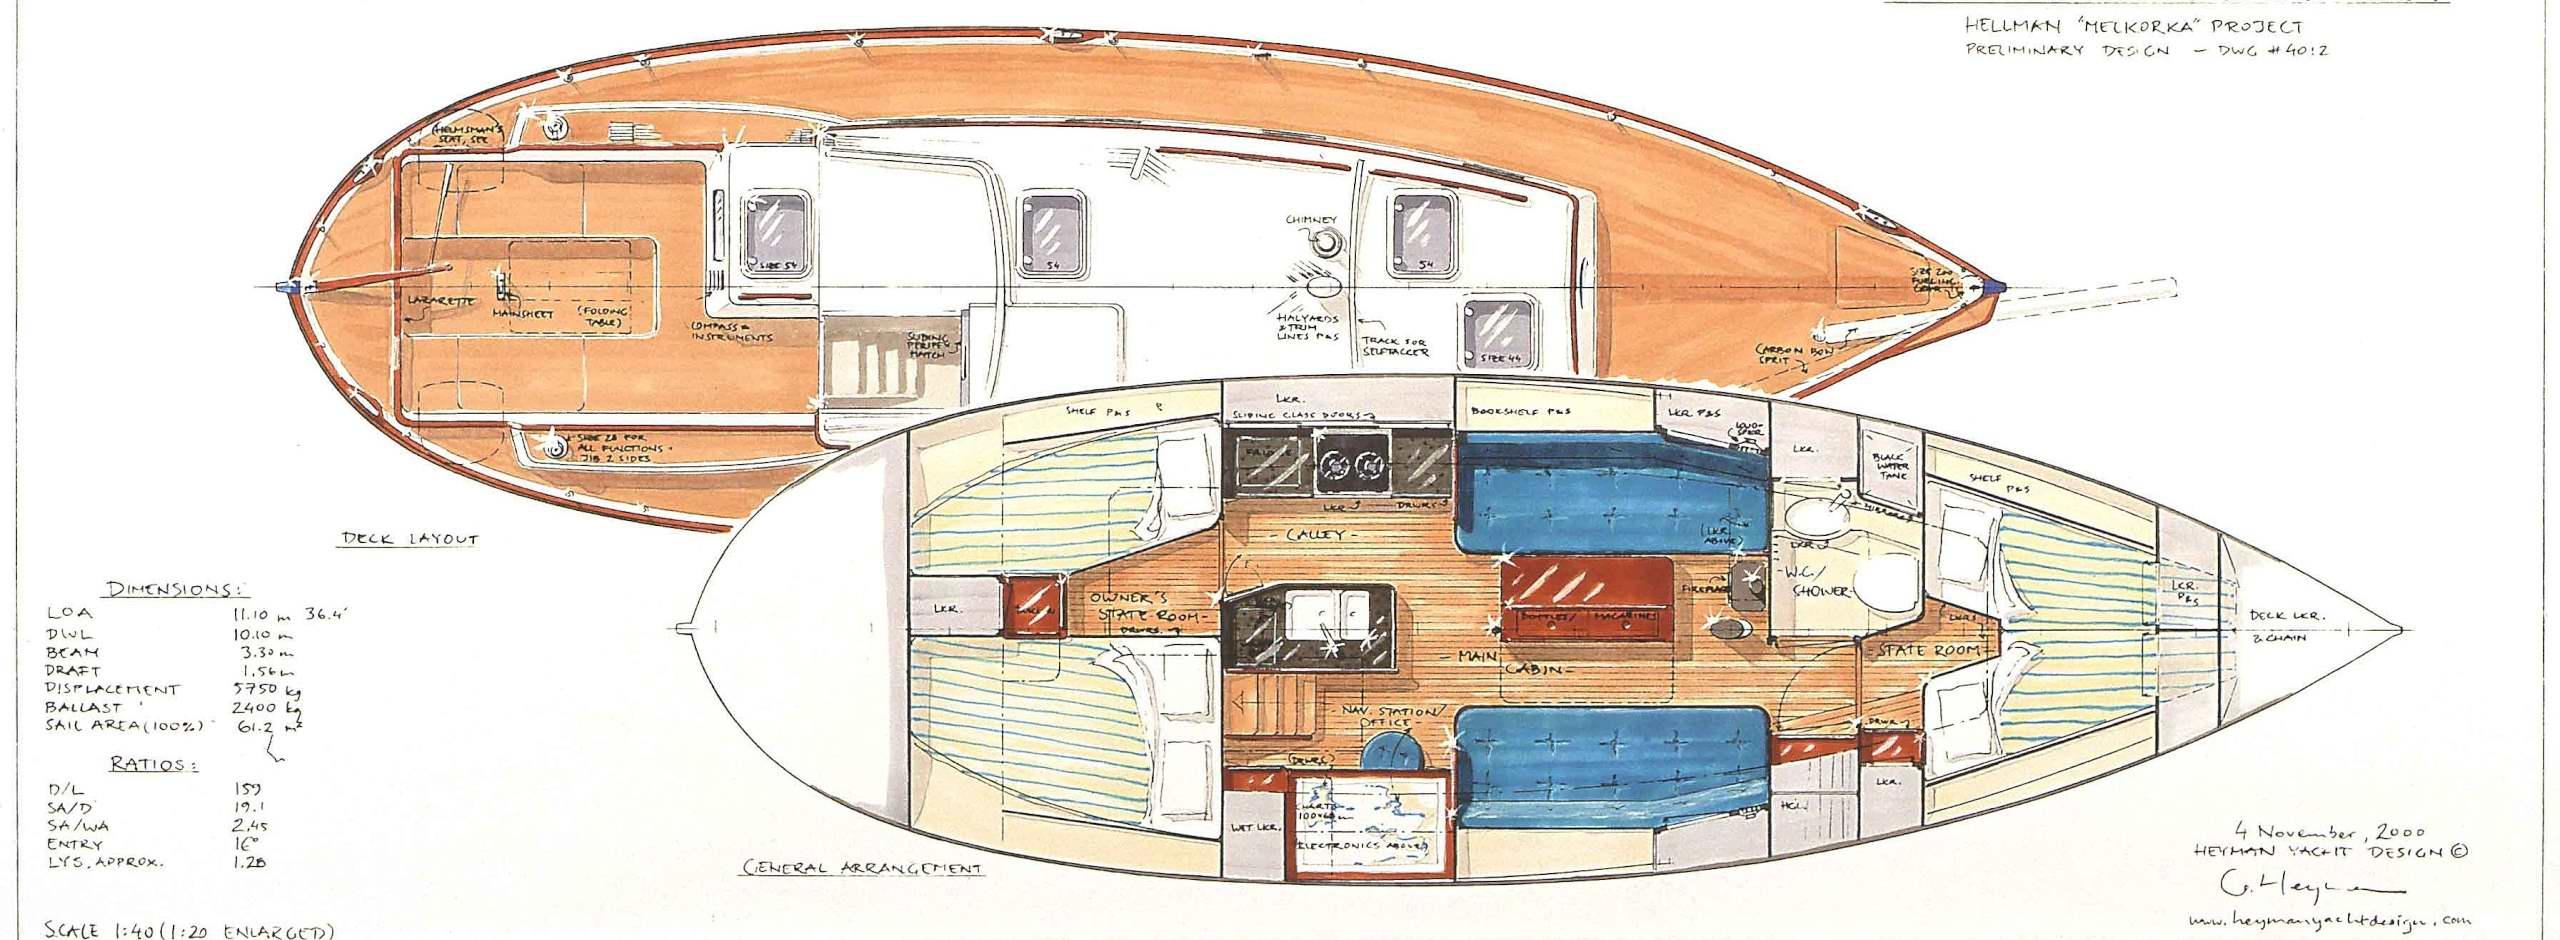 36' earlier design